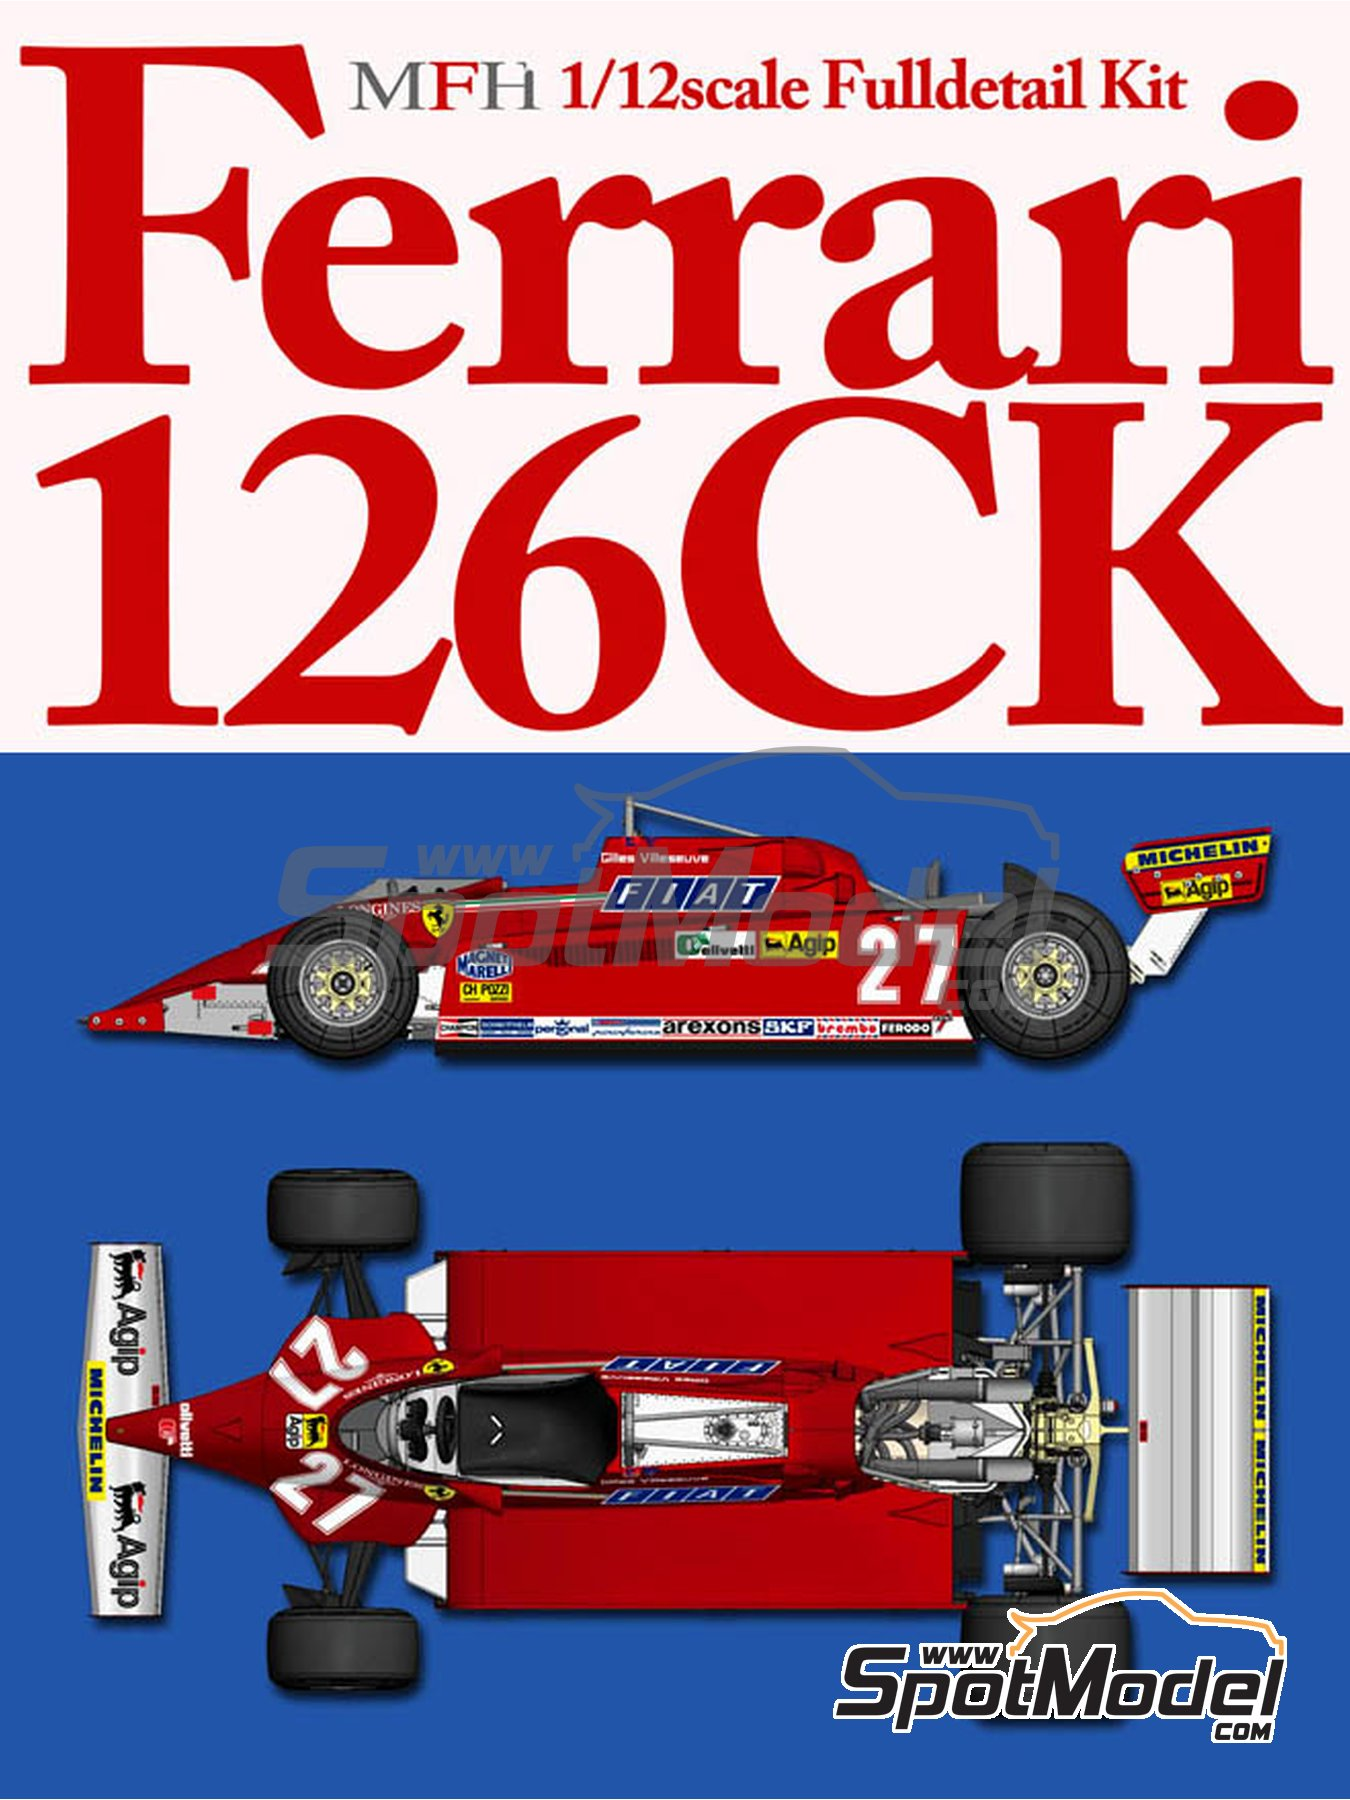 Ferrari 126CK - Monaco Formula 1 Grand Prix 1981 | Model car kit in 1/12 scale manufactured by Model Factory Hiro (ref.MFH-K529, also K-529) image